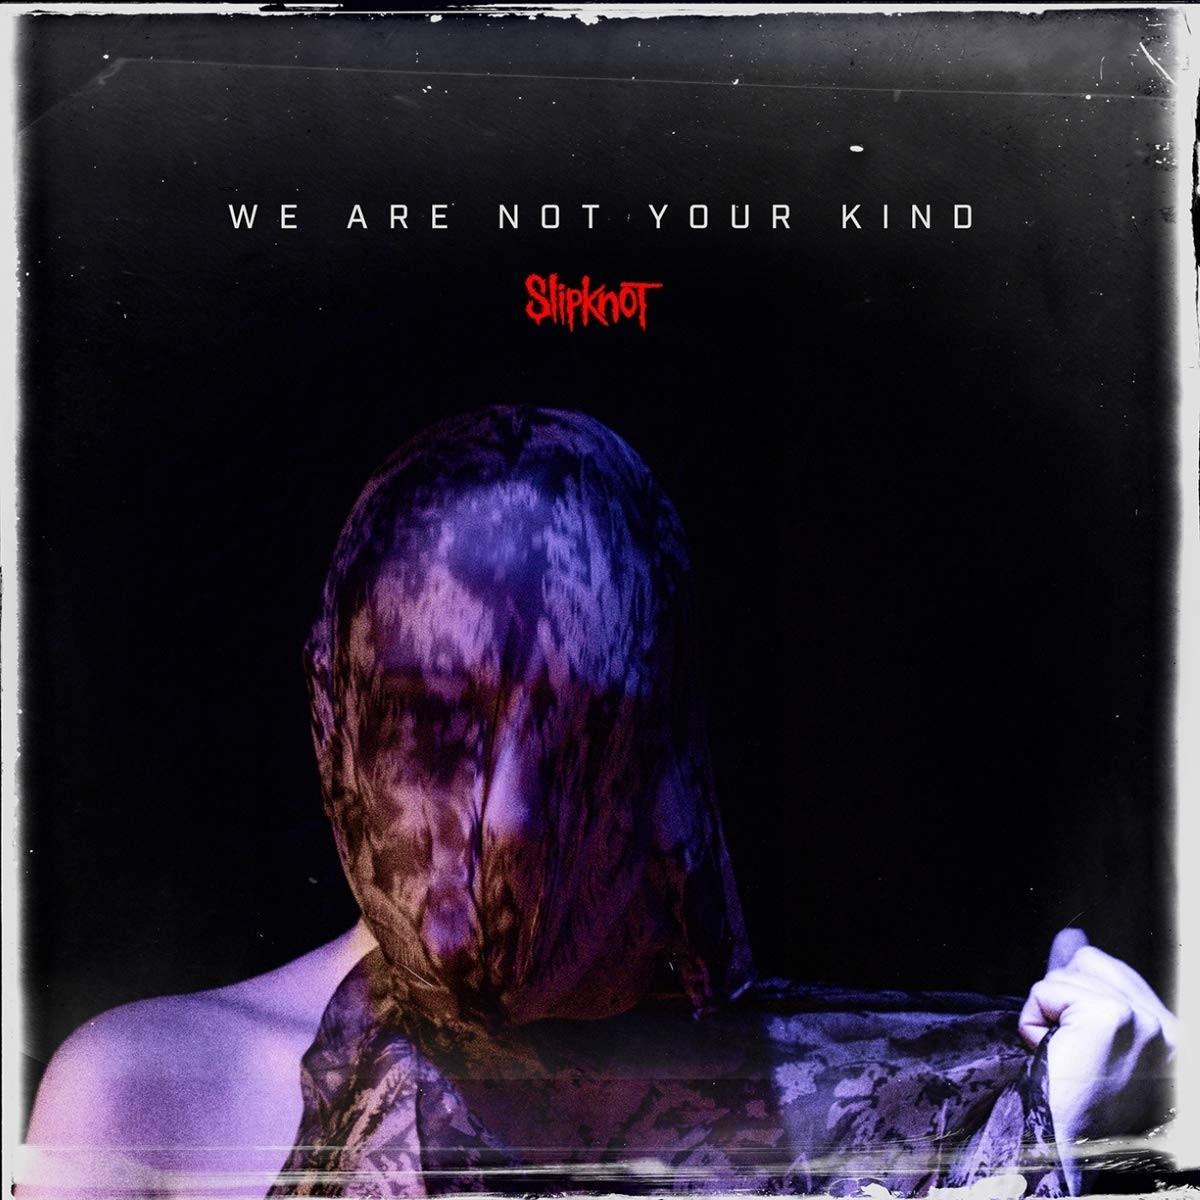 Slipknot - We Are Not Your Kind Vinyl LP